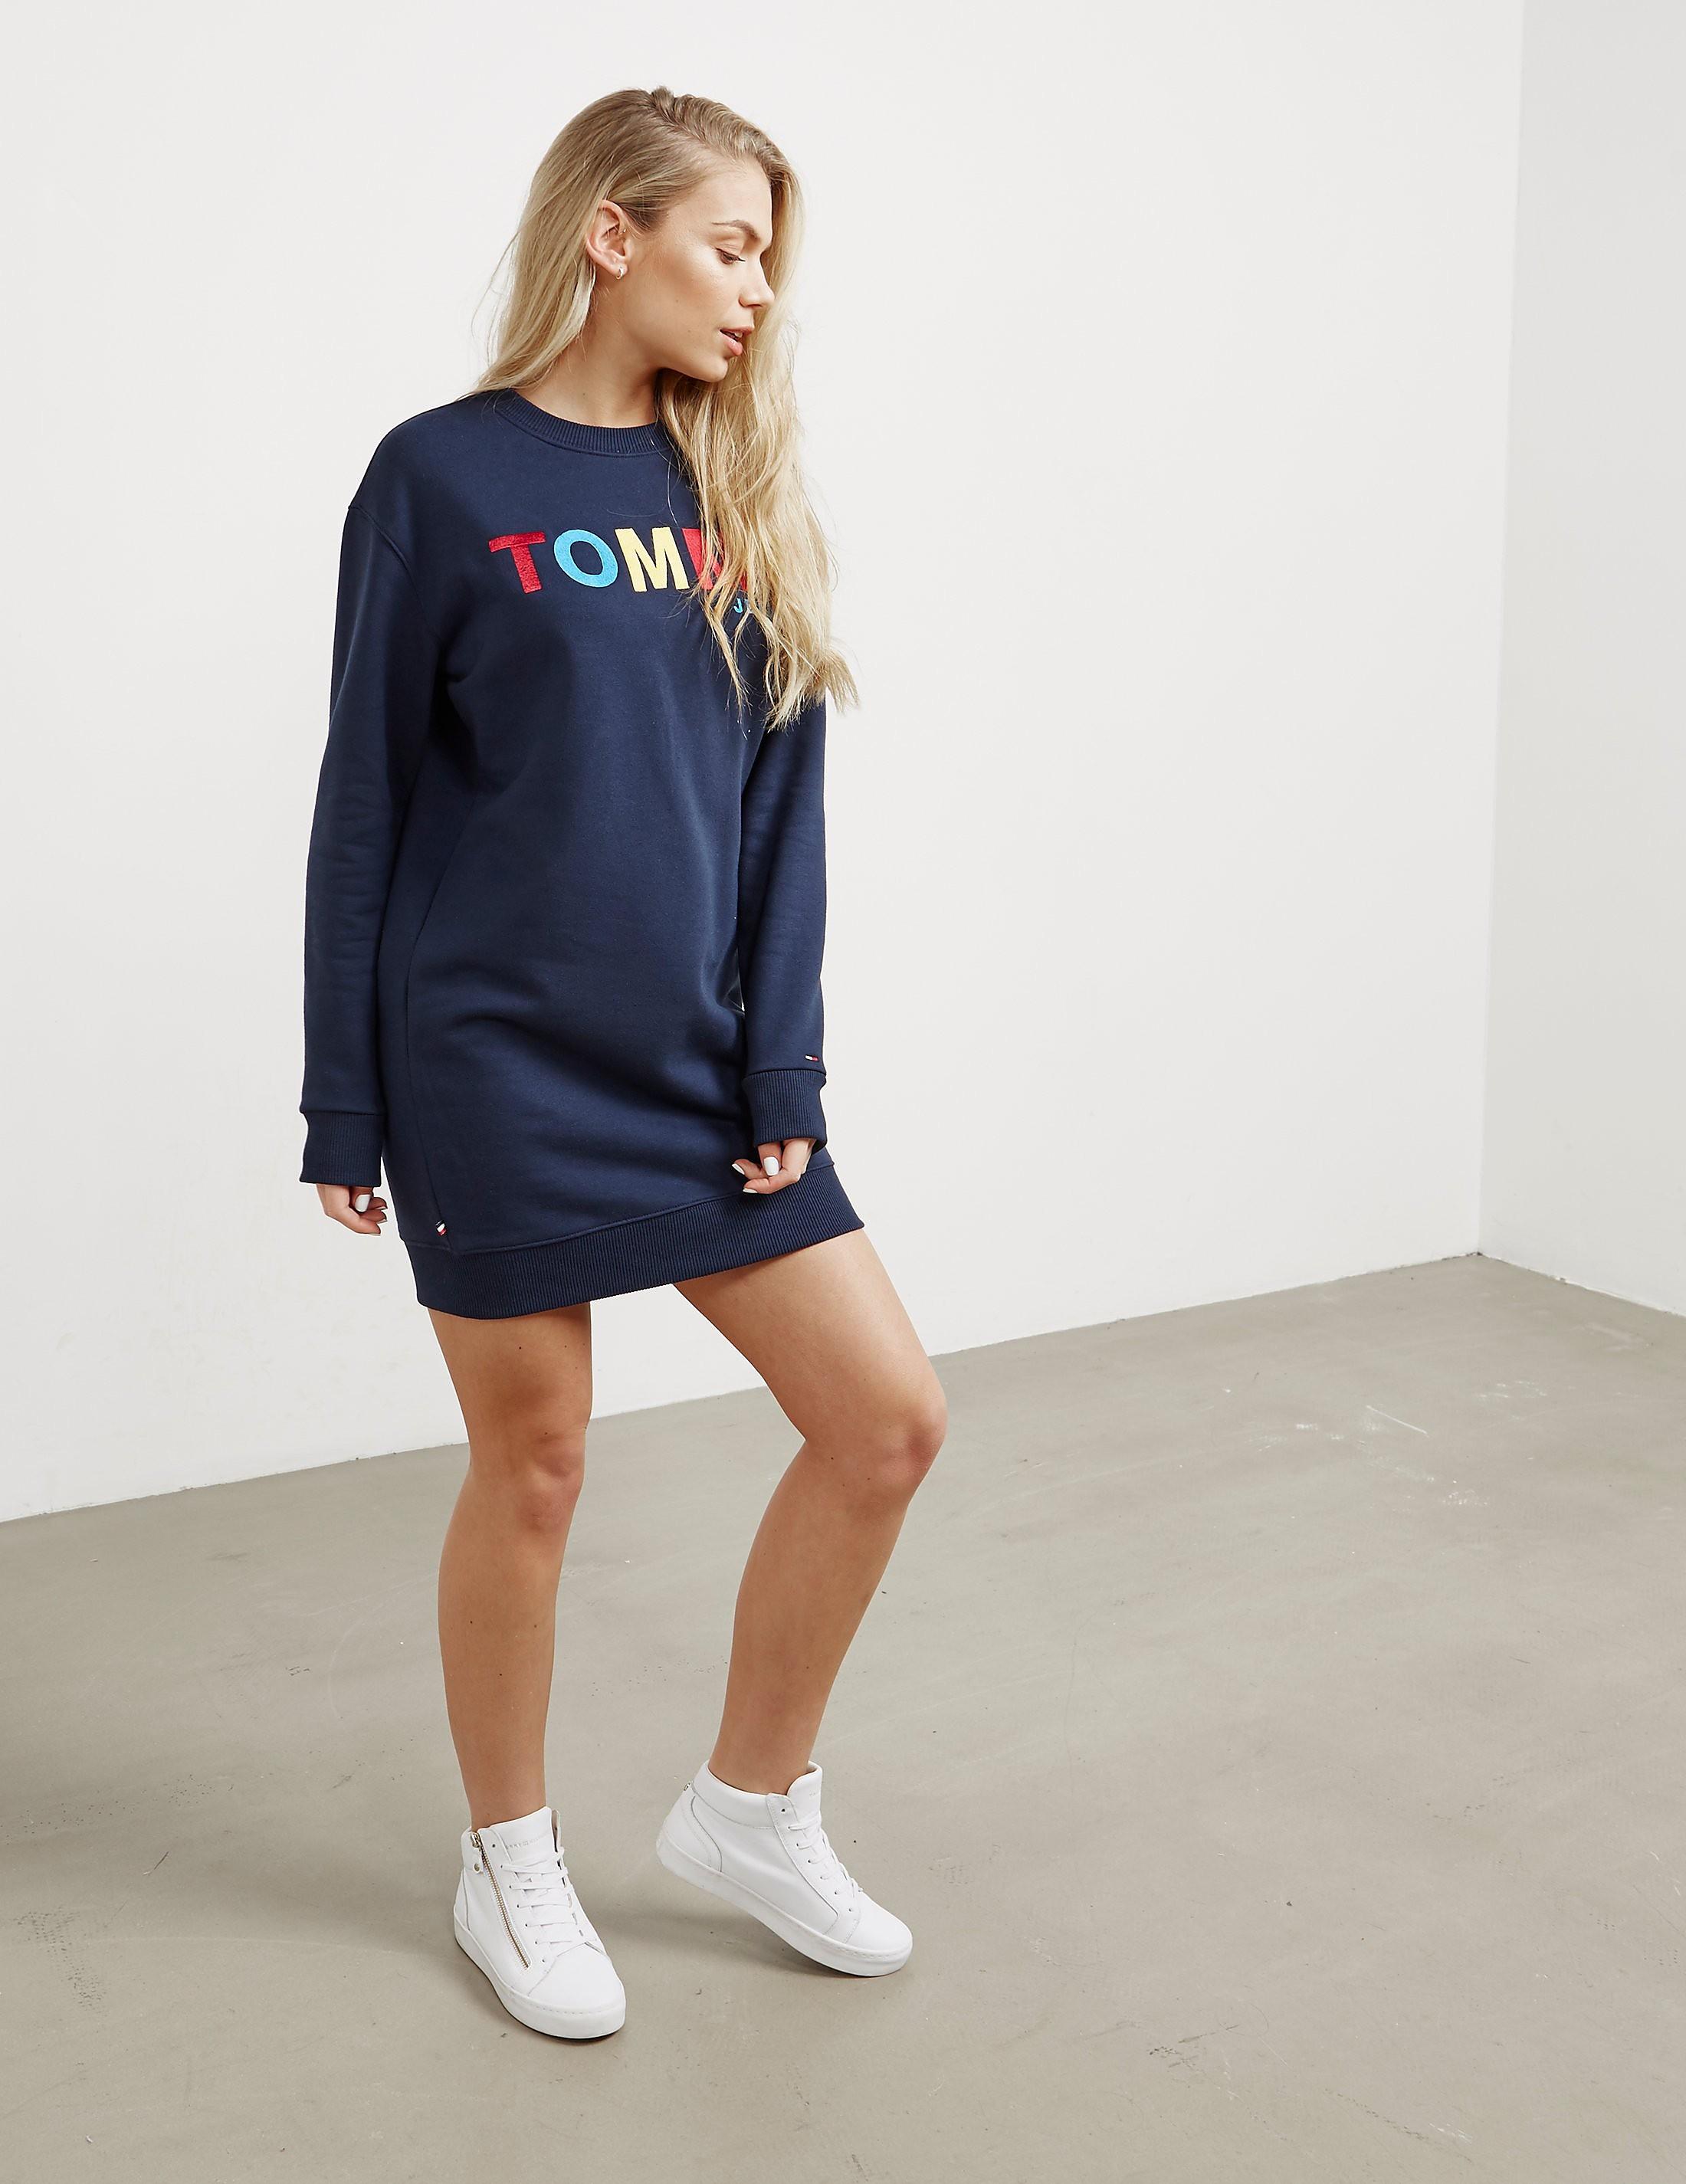 Tommy Hilfiger Sweatshirt Dress